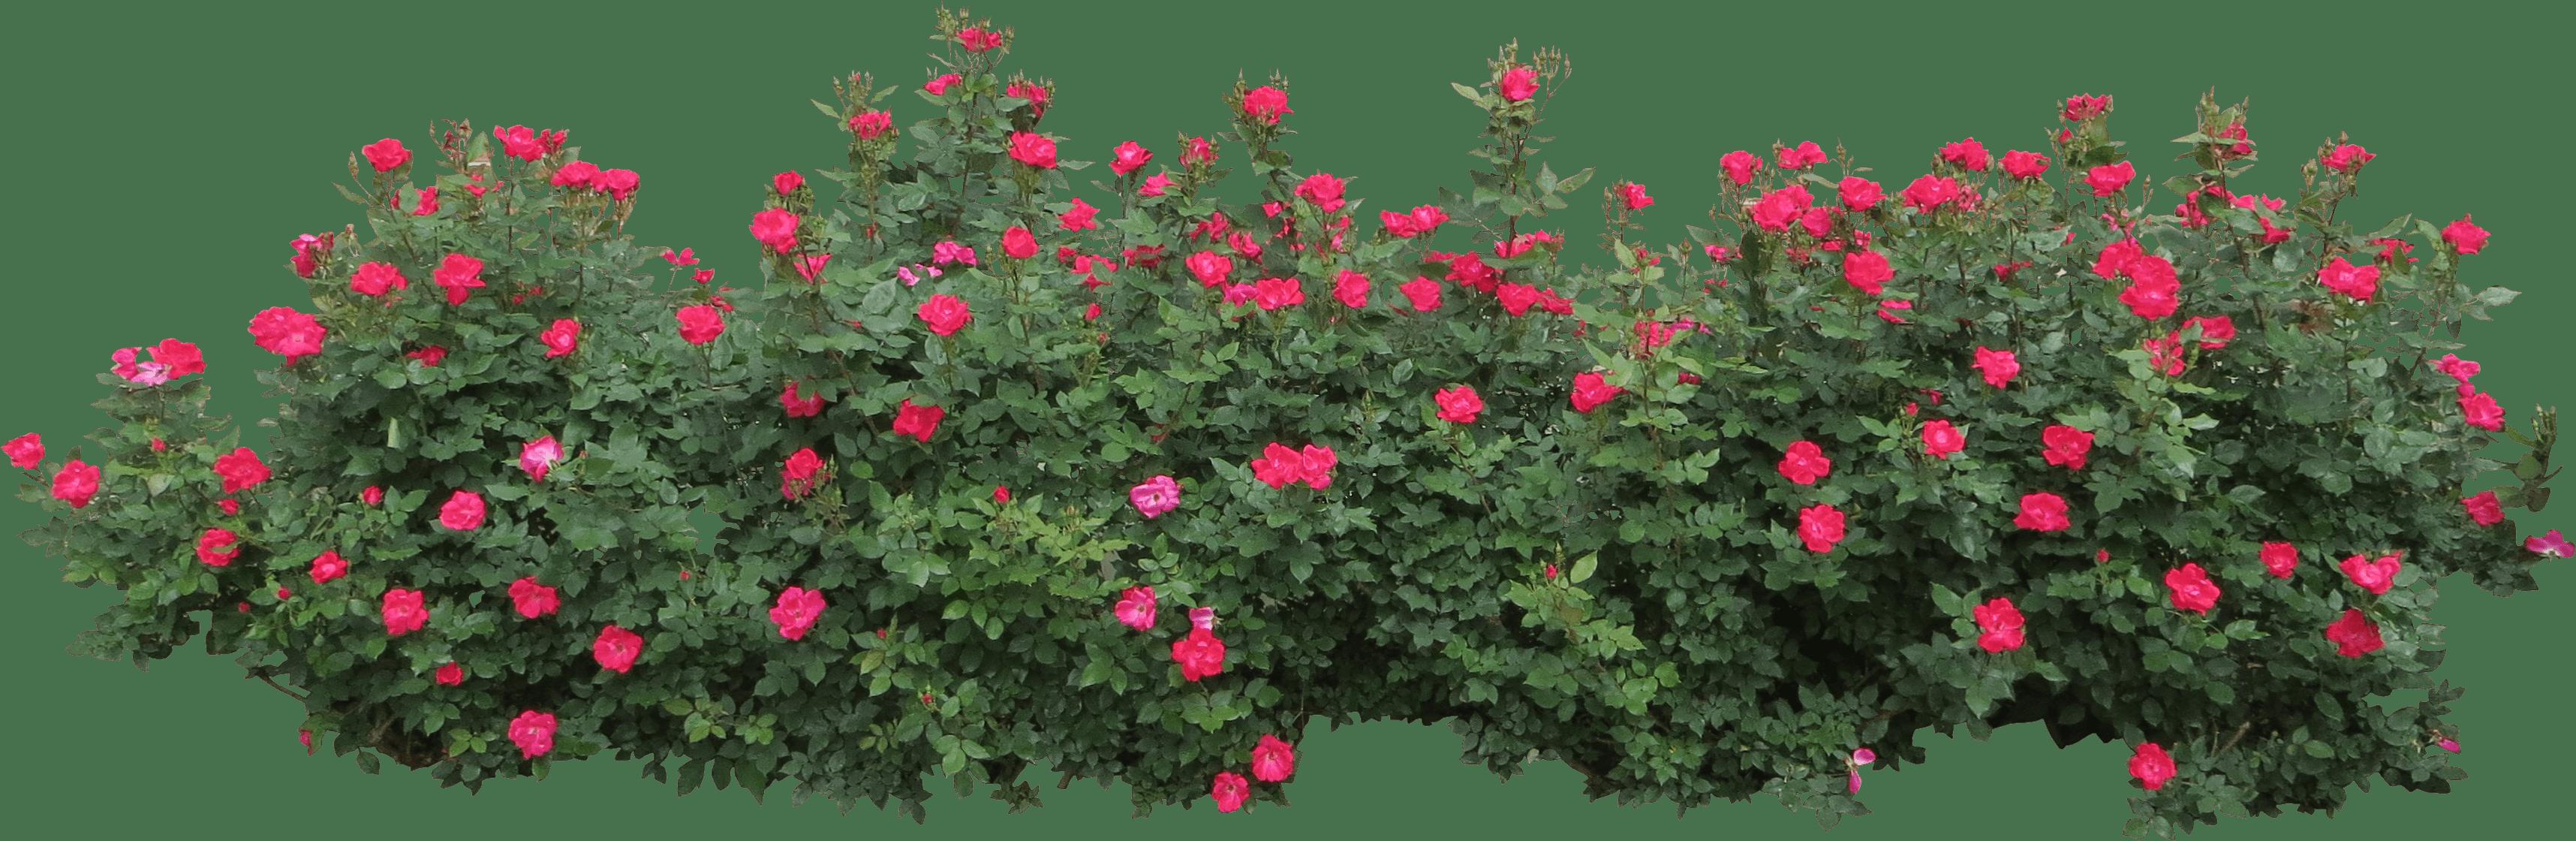 Rose clipart shrub. Bush png free images